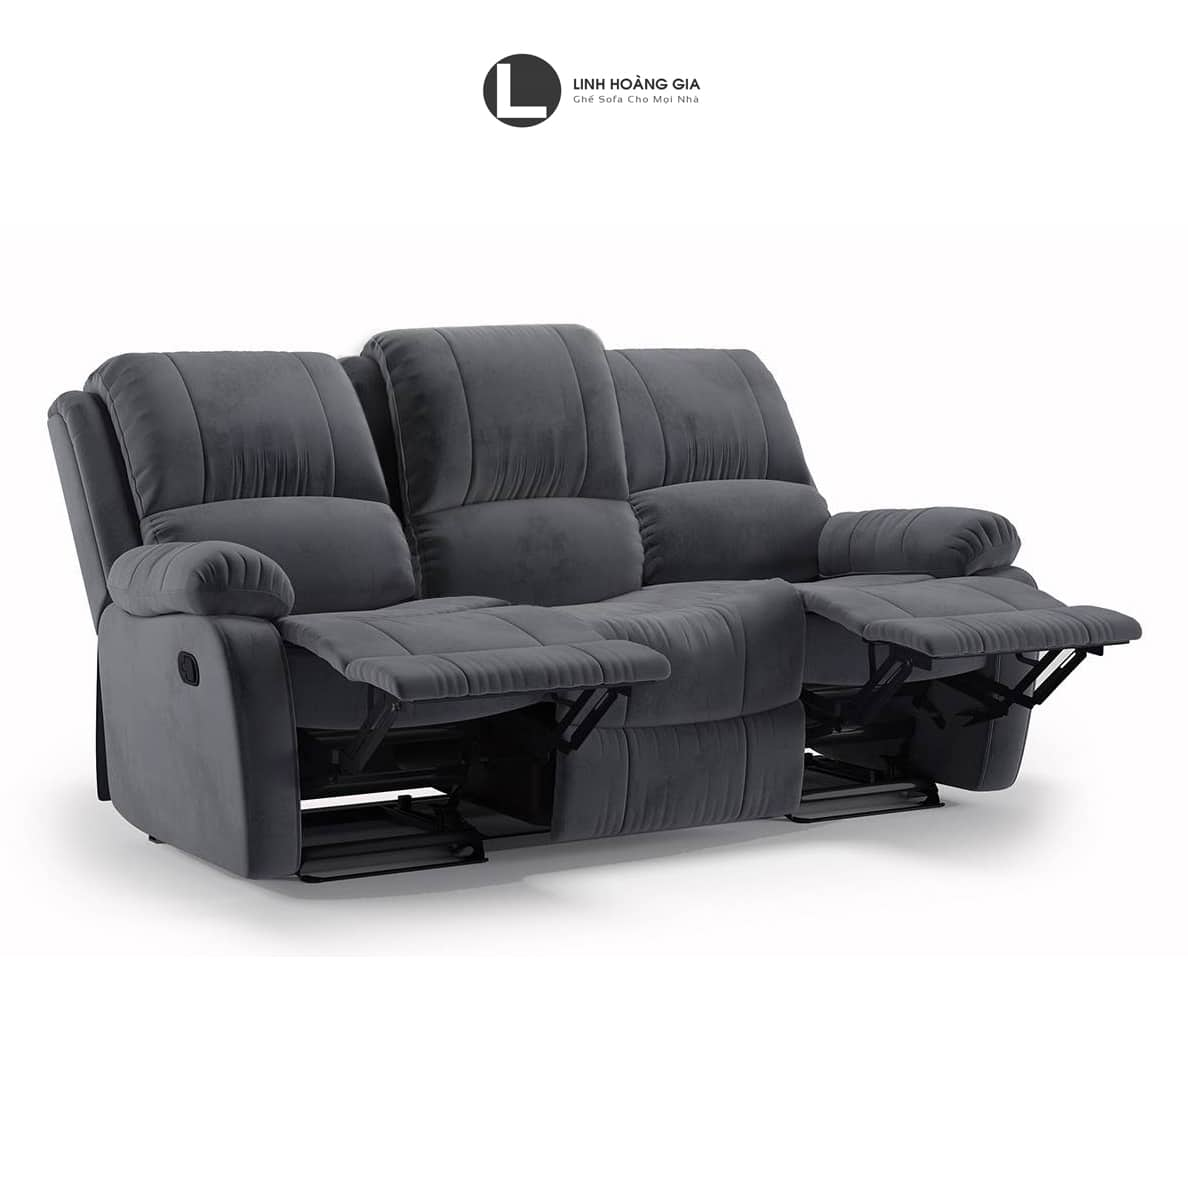 Sofa thư giãn cao cấp ZT21